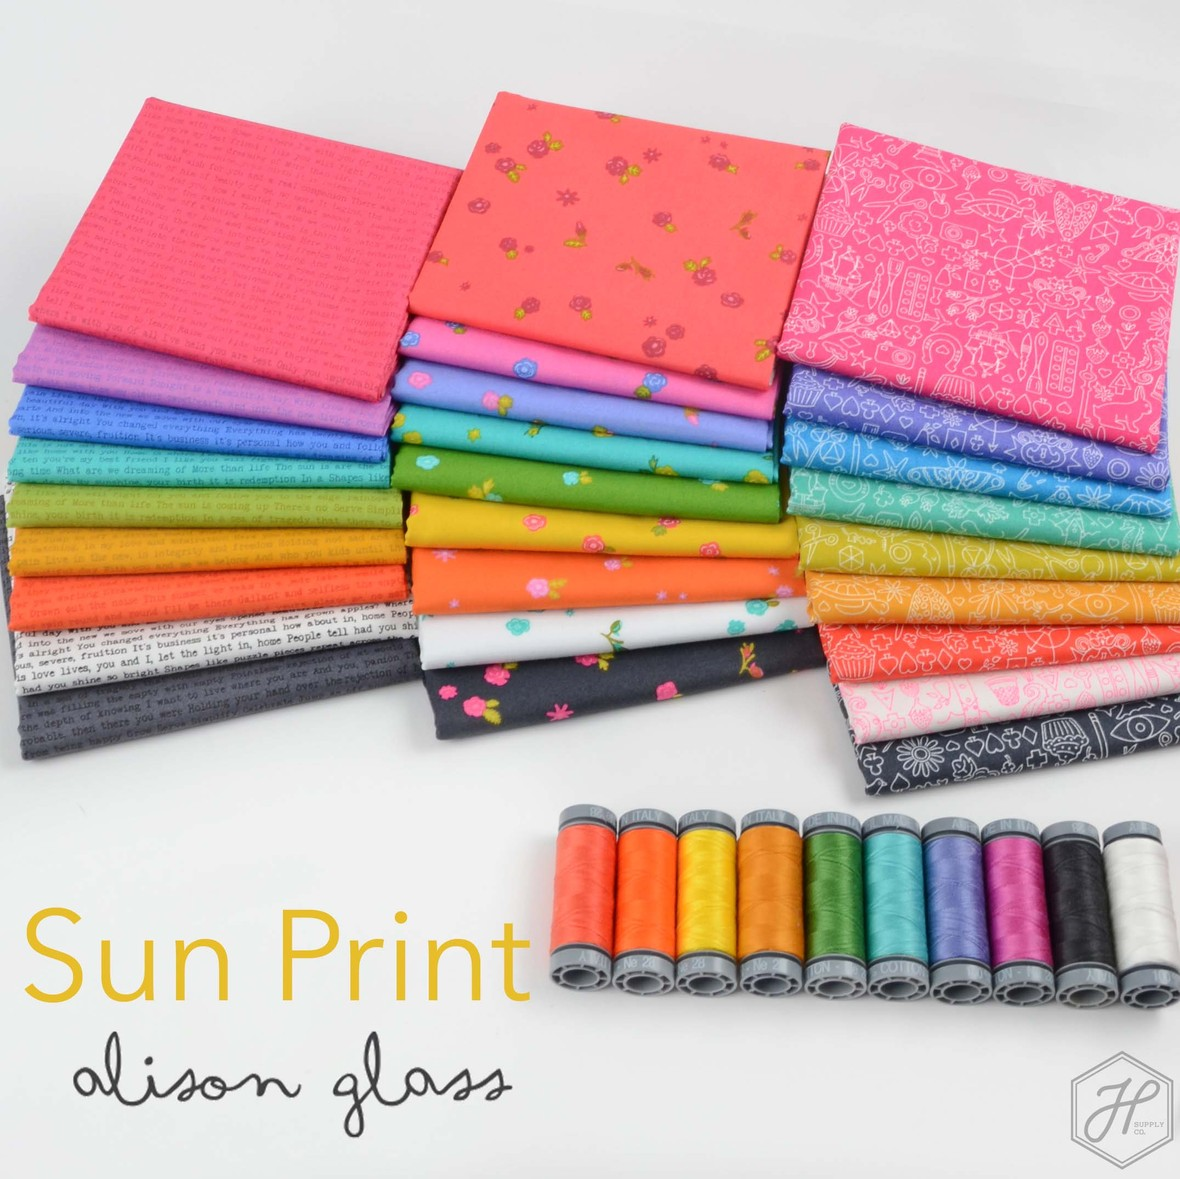 Sun Print Alison Glass at Hawthorne Supply Co